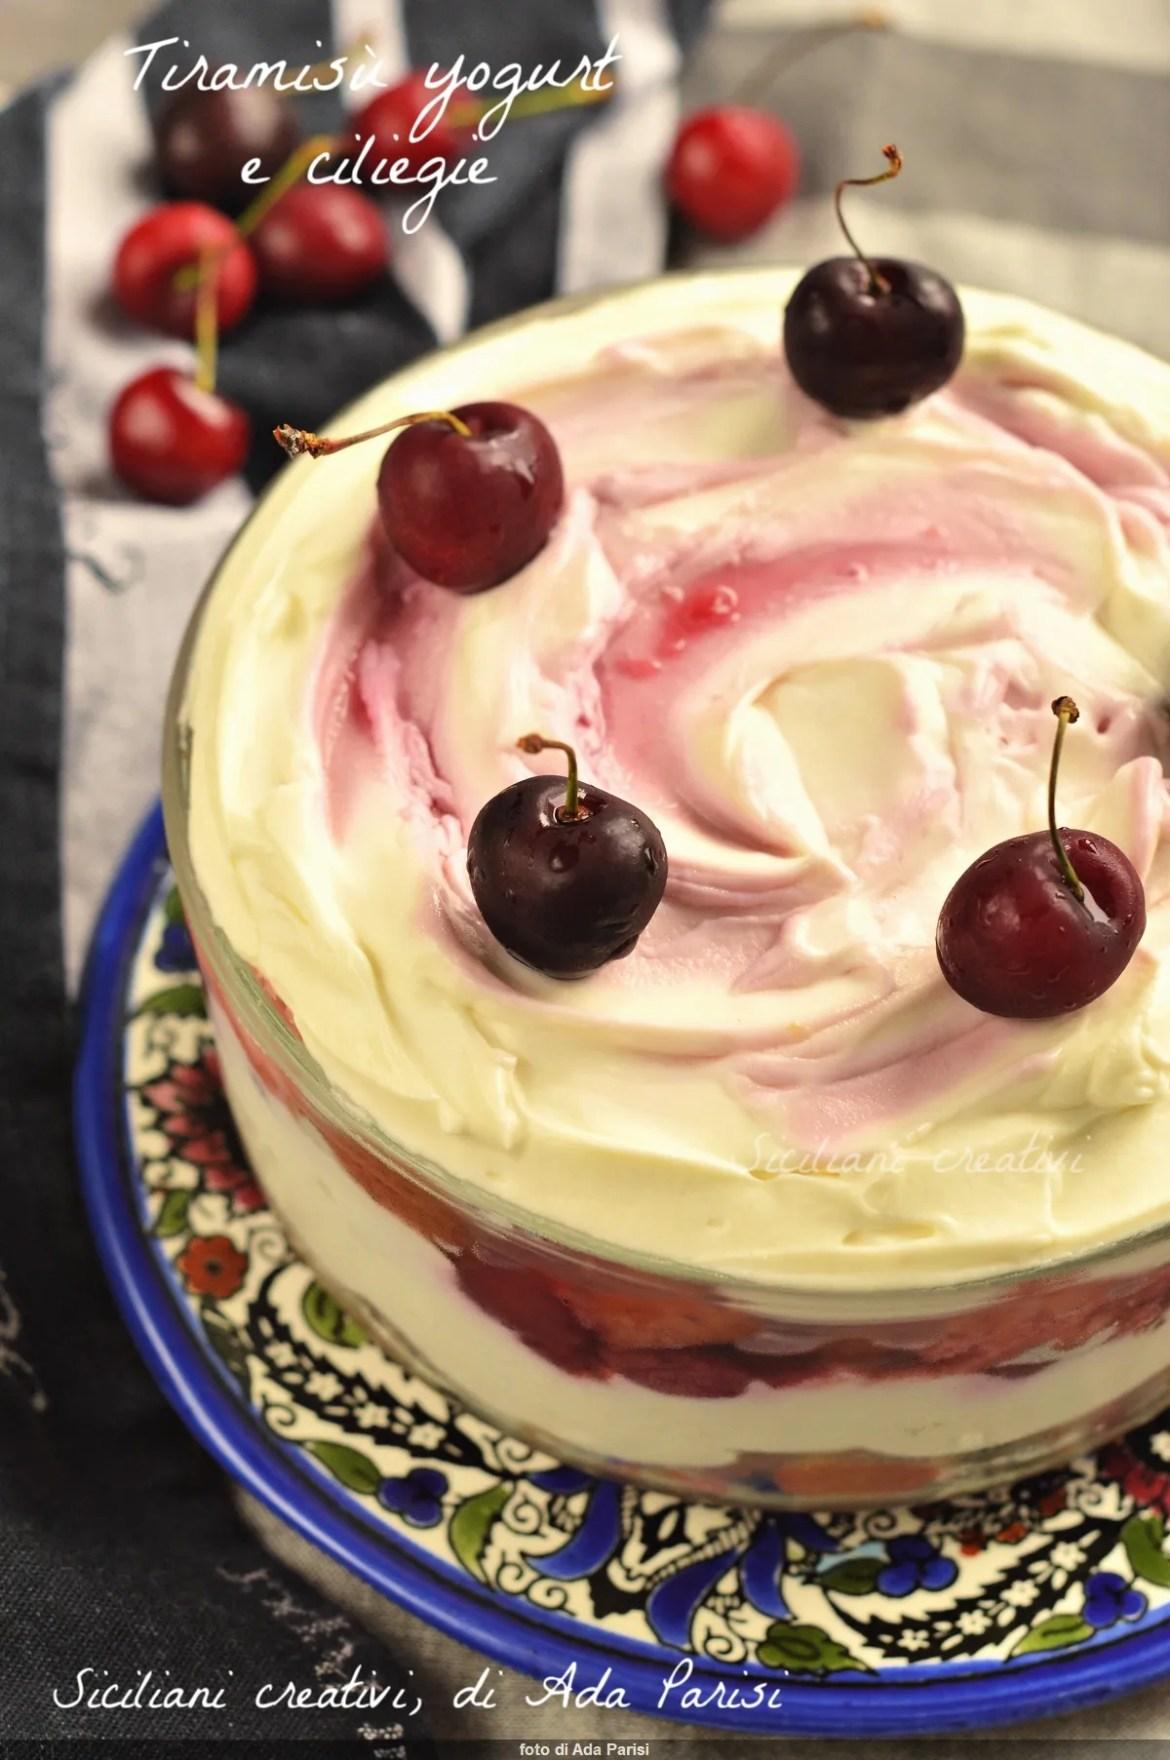 Tiramisù yogurt e ciliegie: senza uova e freschissimo